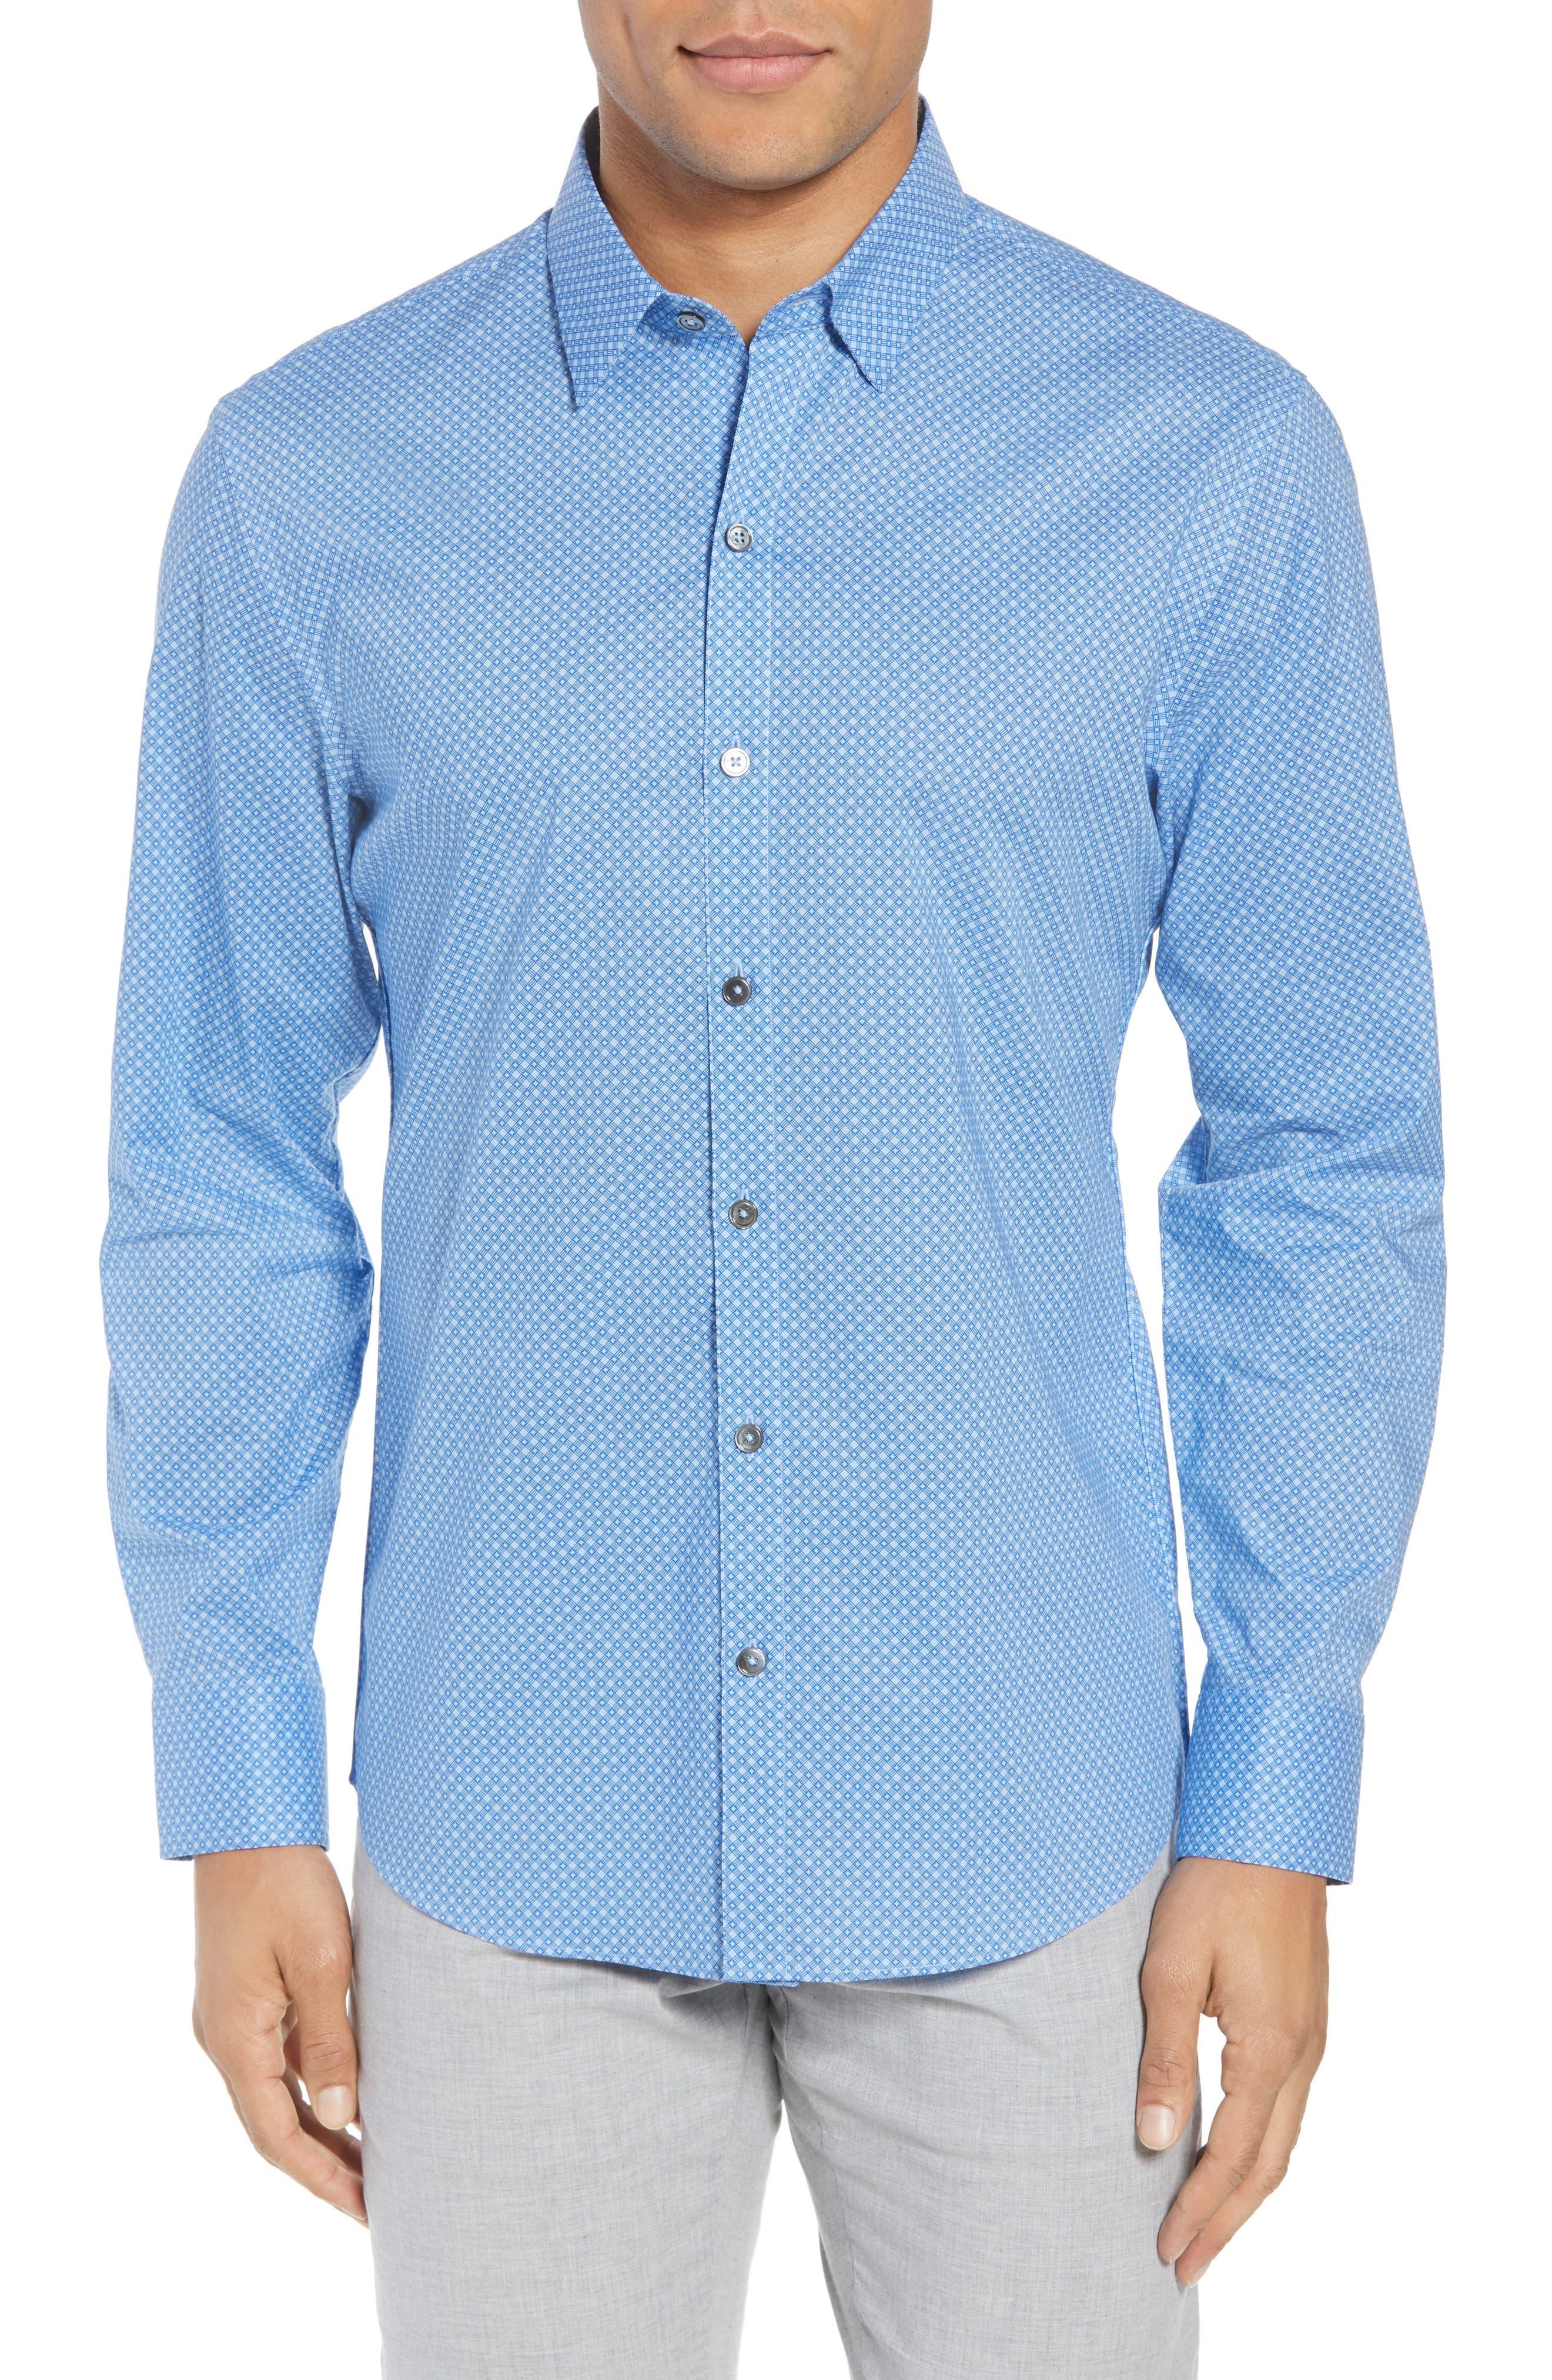 Ethan Slim Fit Sport Shirt,                         Main,                         color, 400